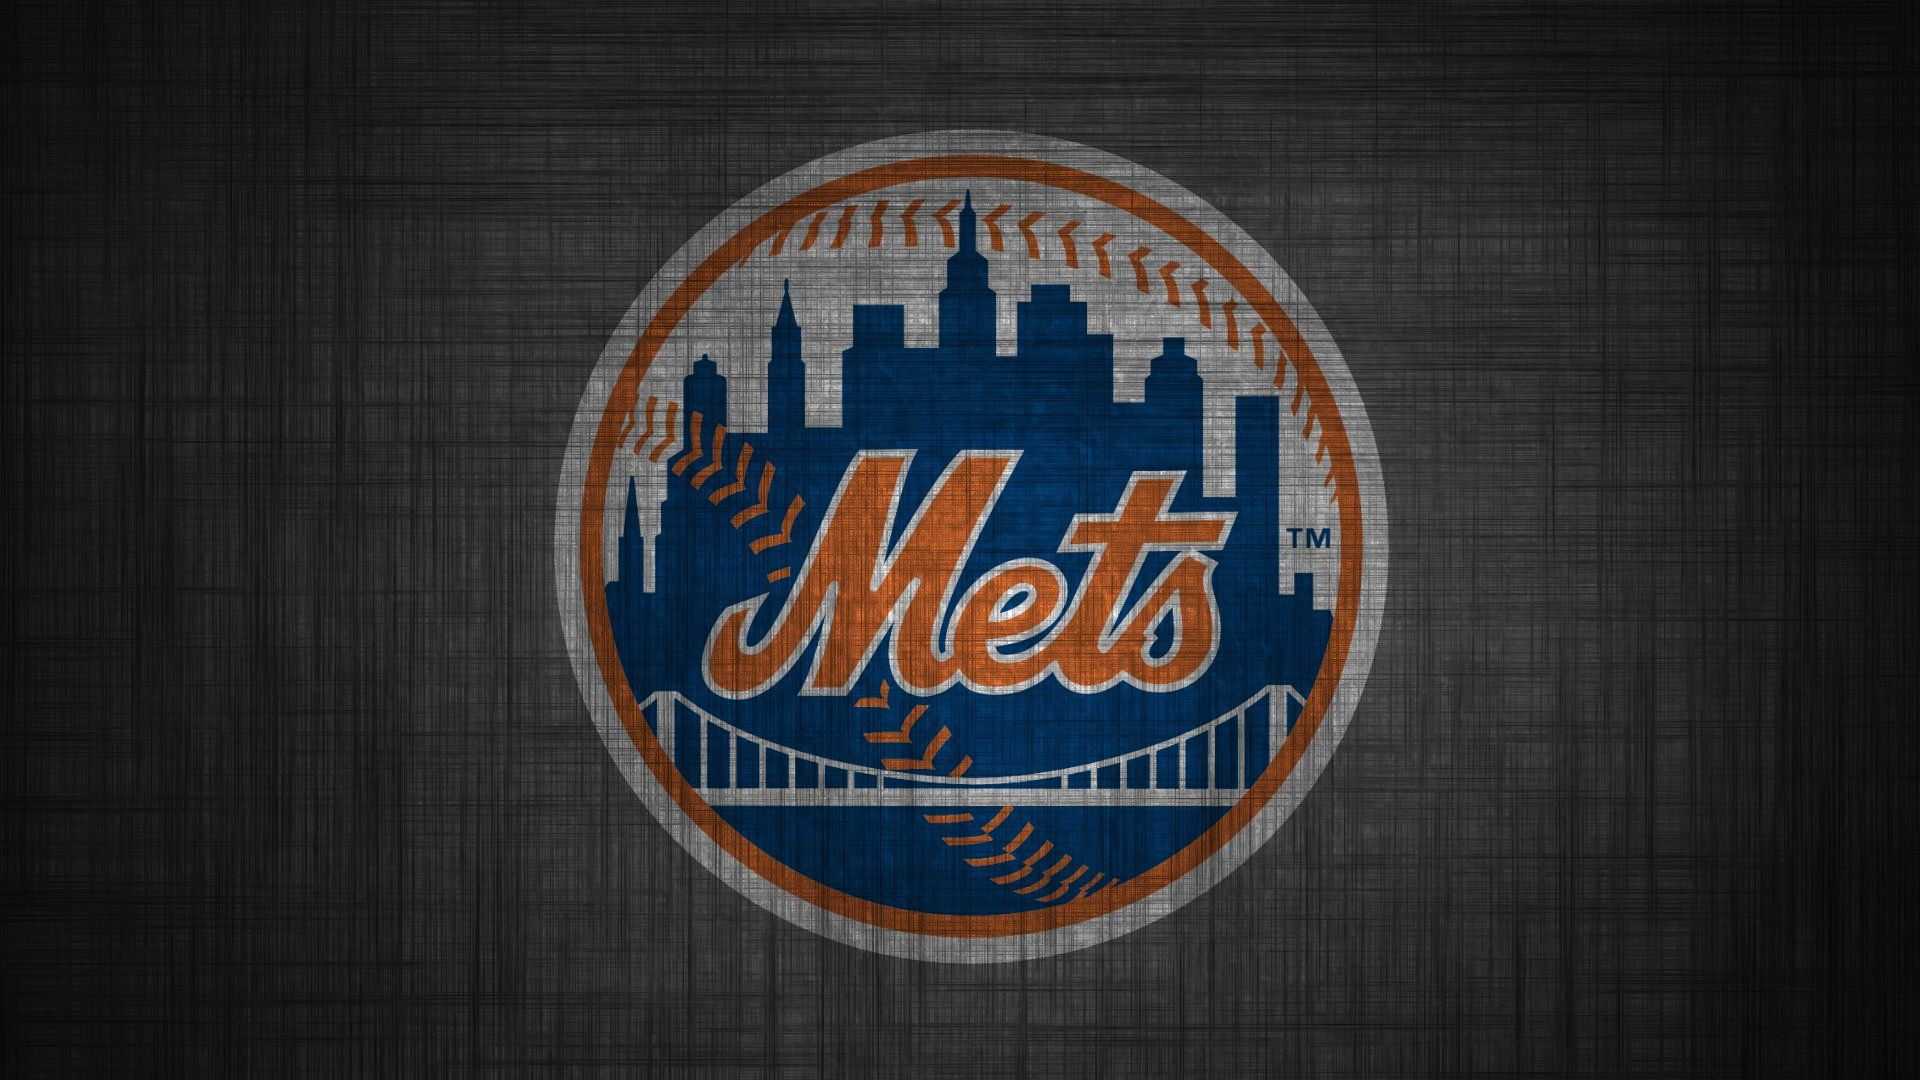 New York Mets Desktop Wallpapers Wallpapers 2020 Check More At